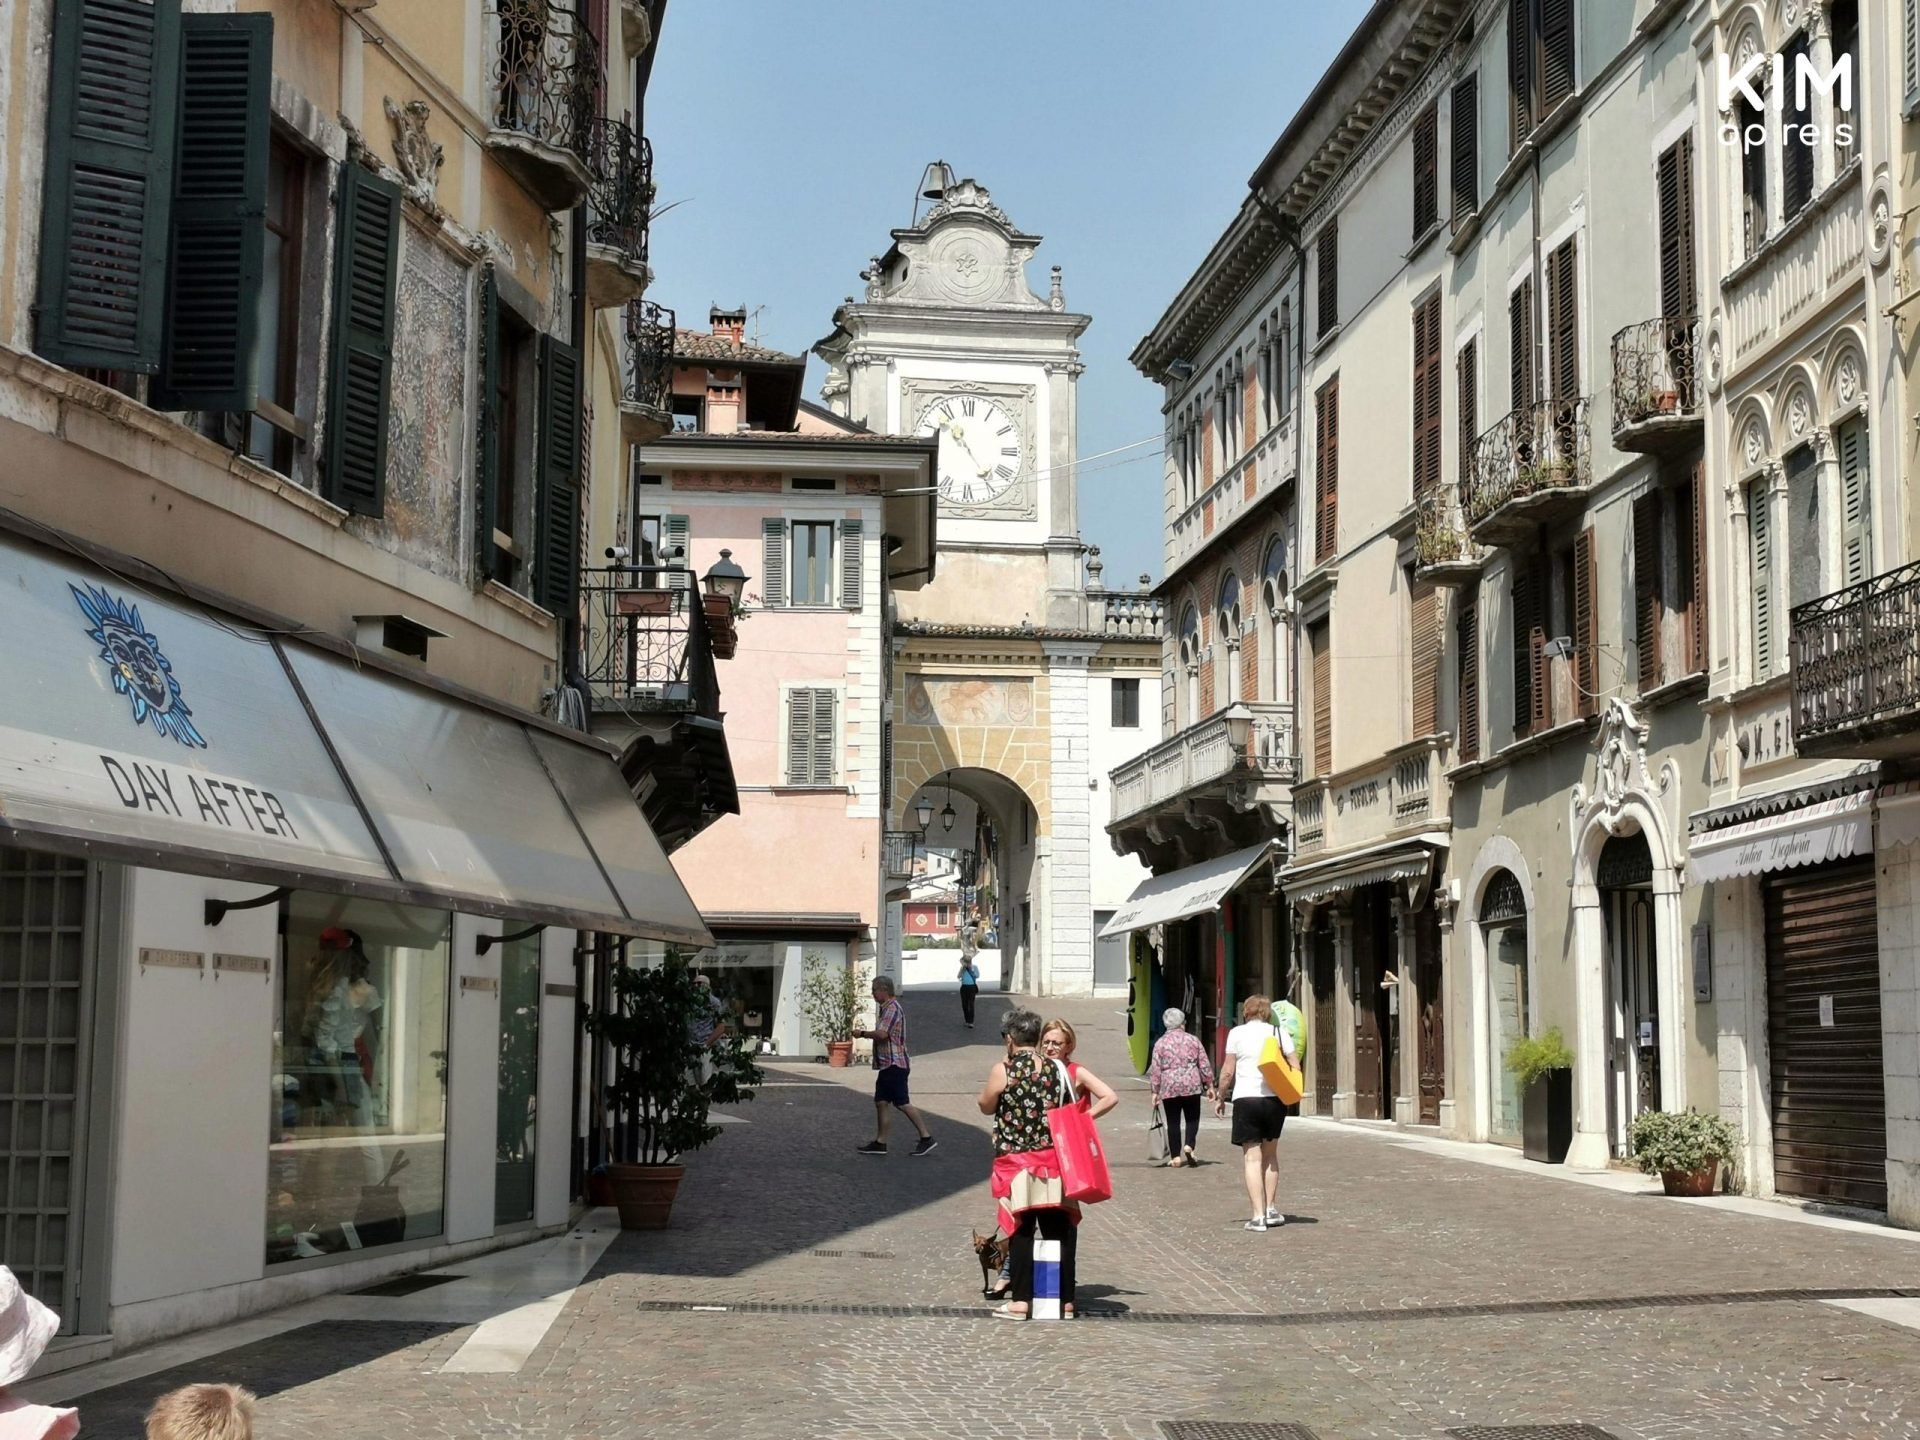 Winkelstraat Salò - nog rustige winkelstraat met enkele shoppers